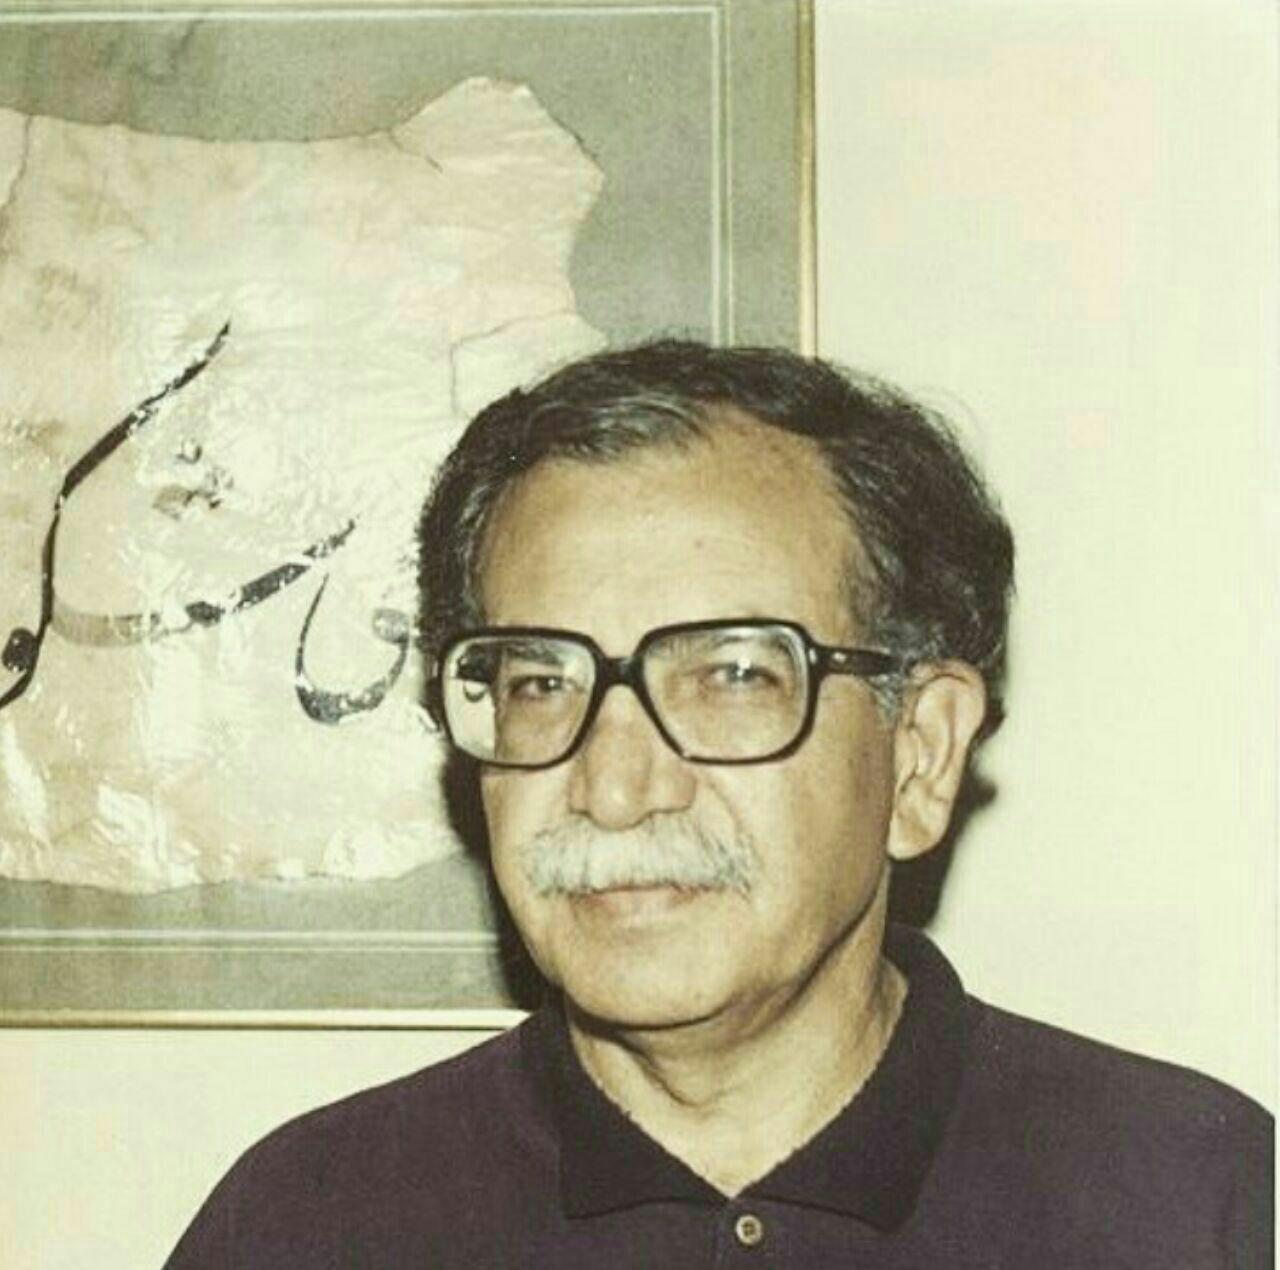 قورد/ علی اشرف درویشیان – چئویرن: ع. ن. چاپار